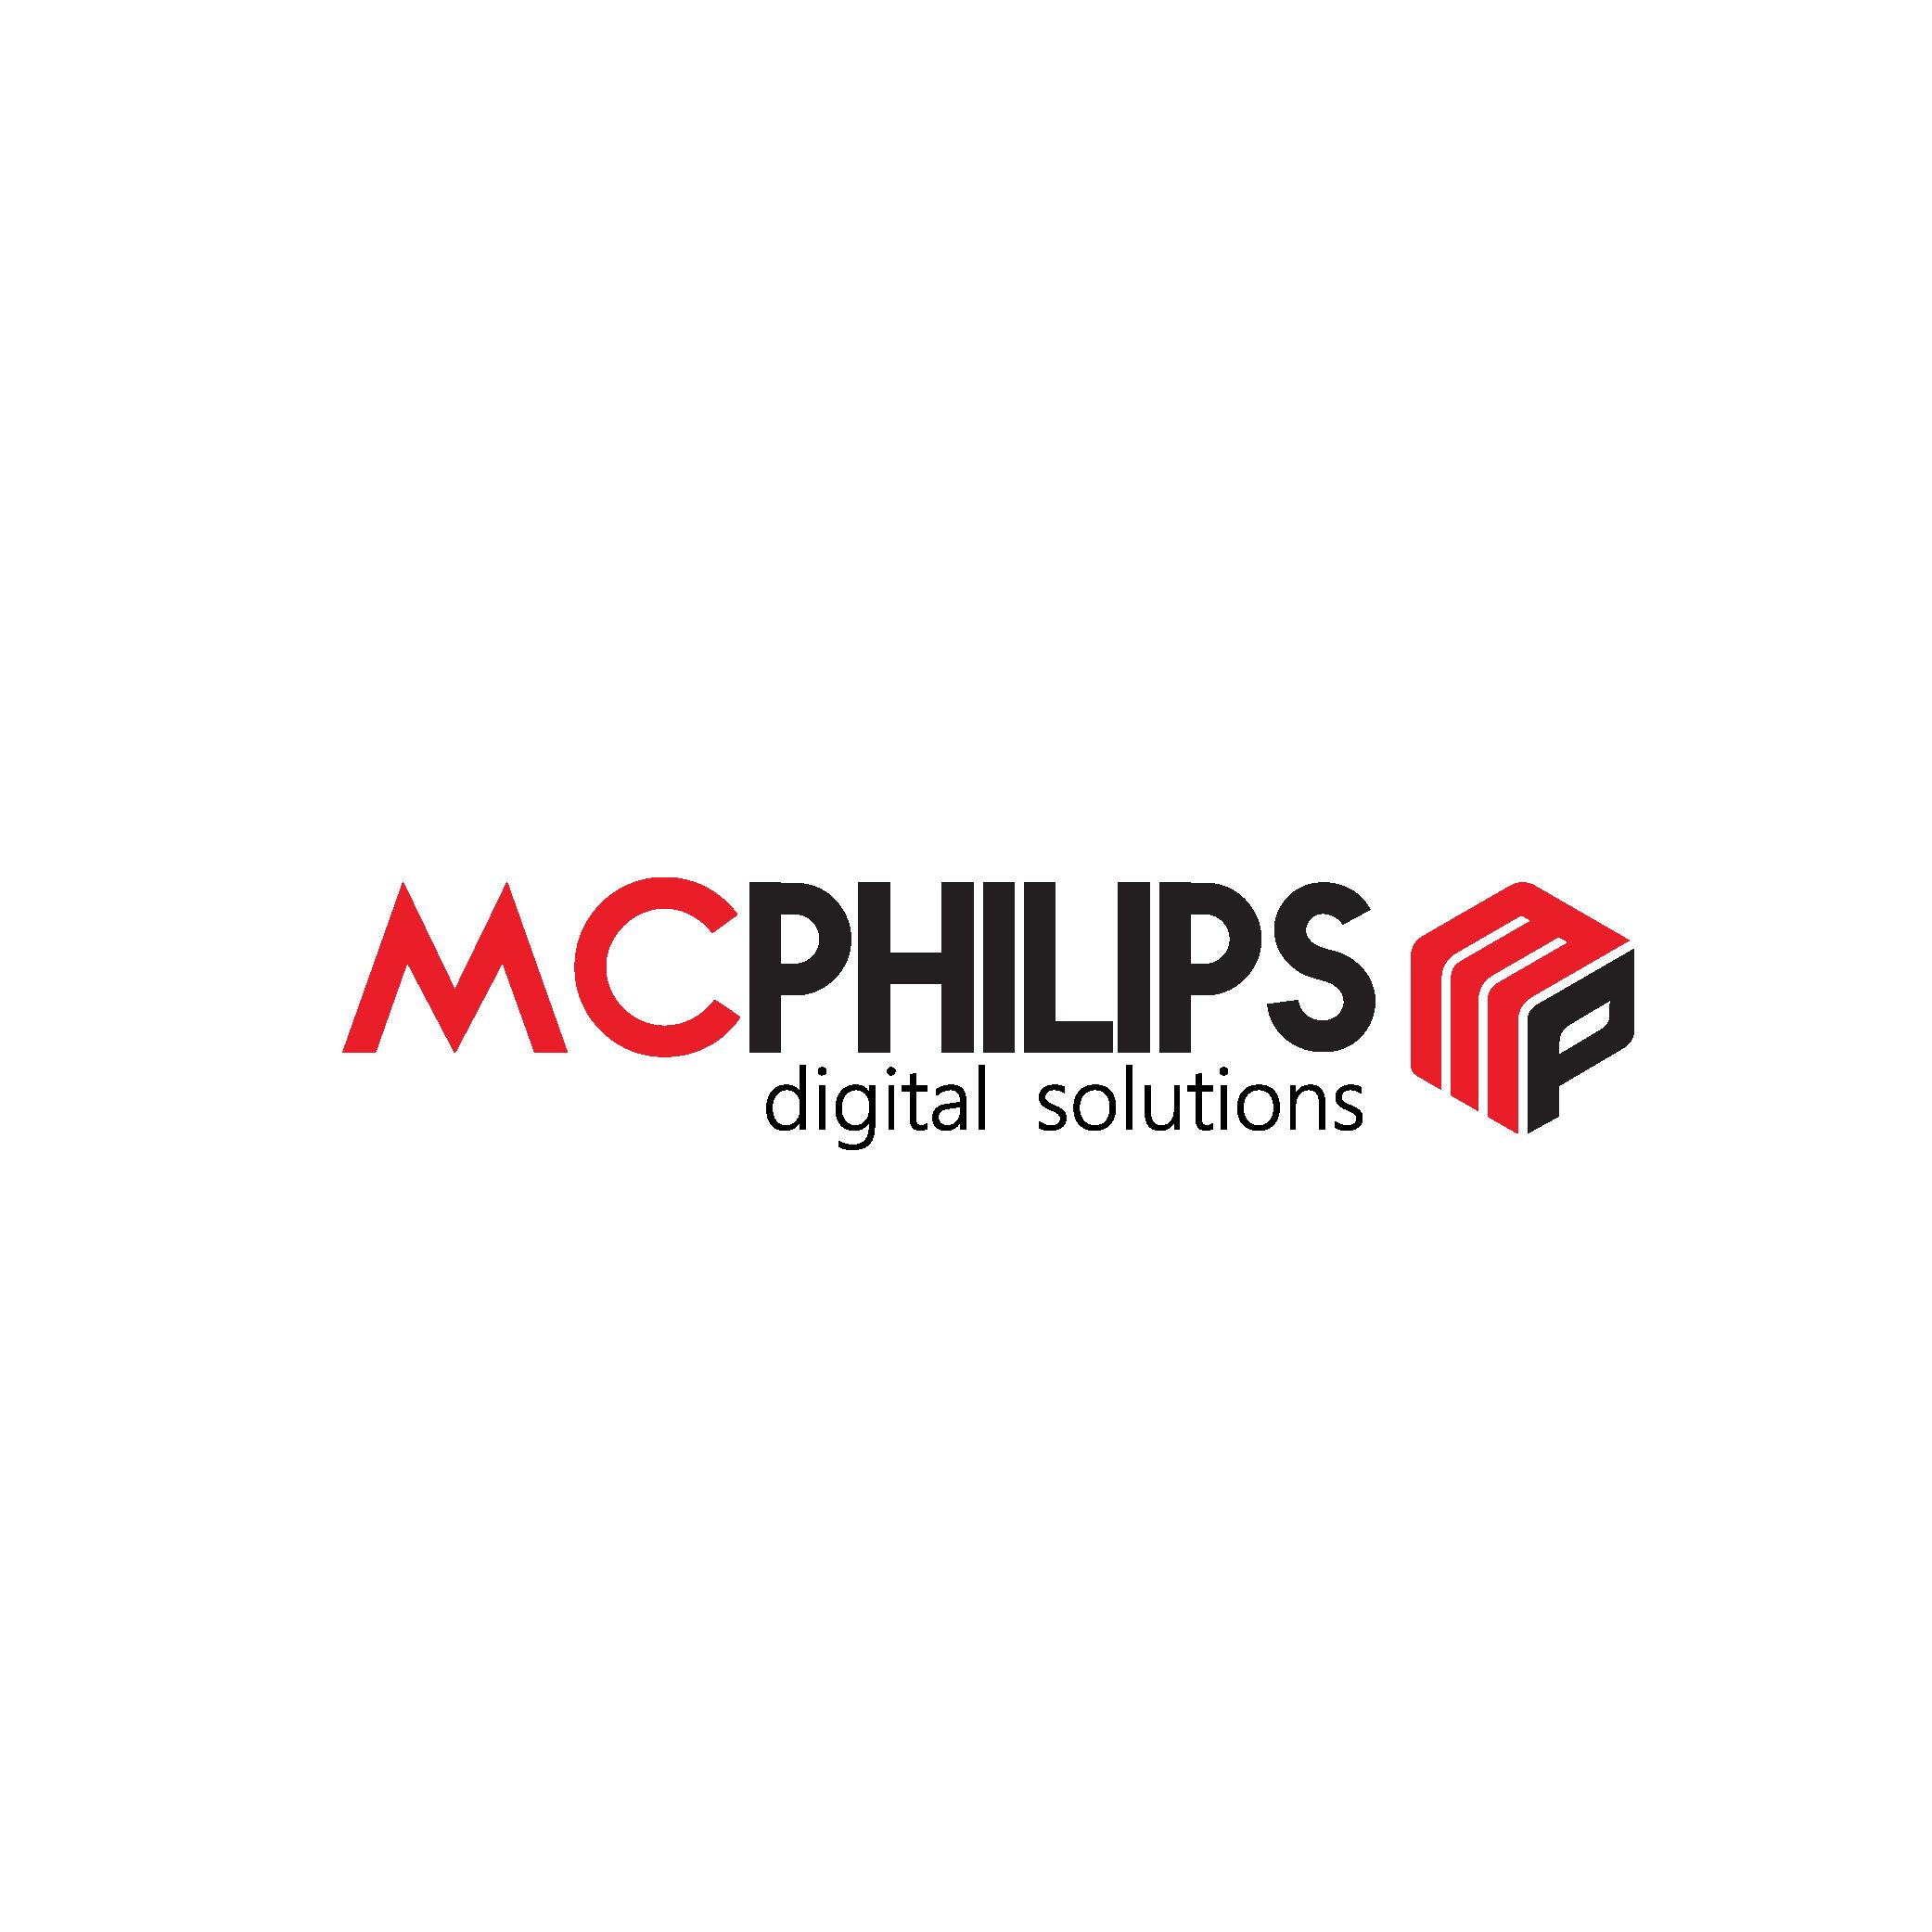 McPhilips